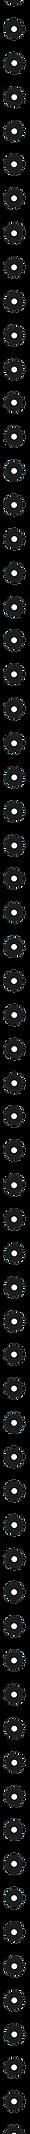 cirkels4.png